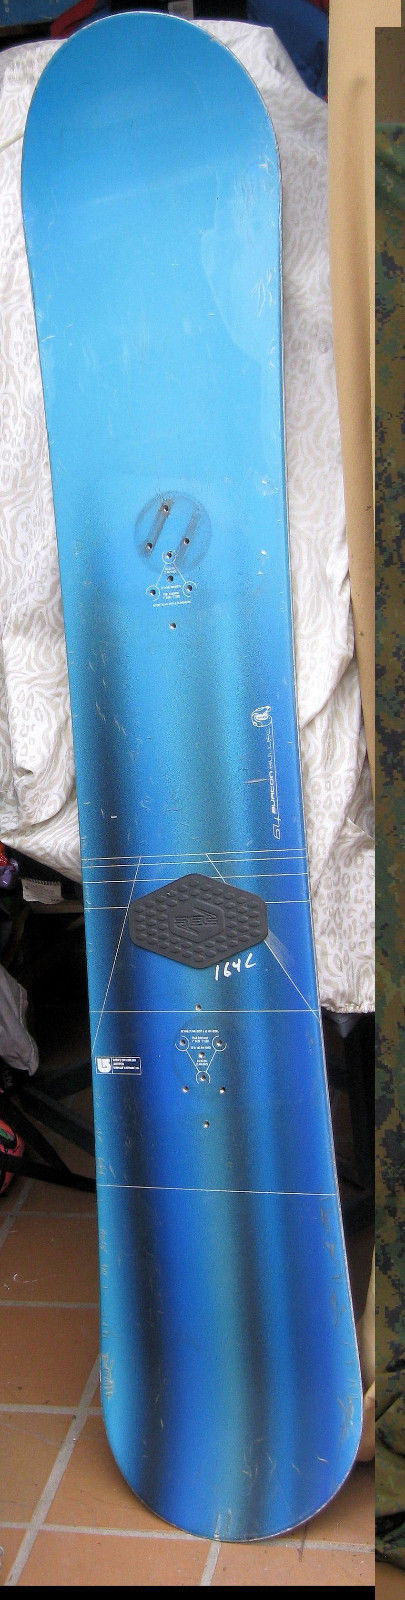 Burton Bullet Snowboard  164 CM Snow Board w/ Stomp Pads Laminate Peeling